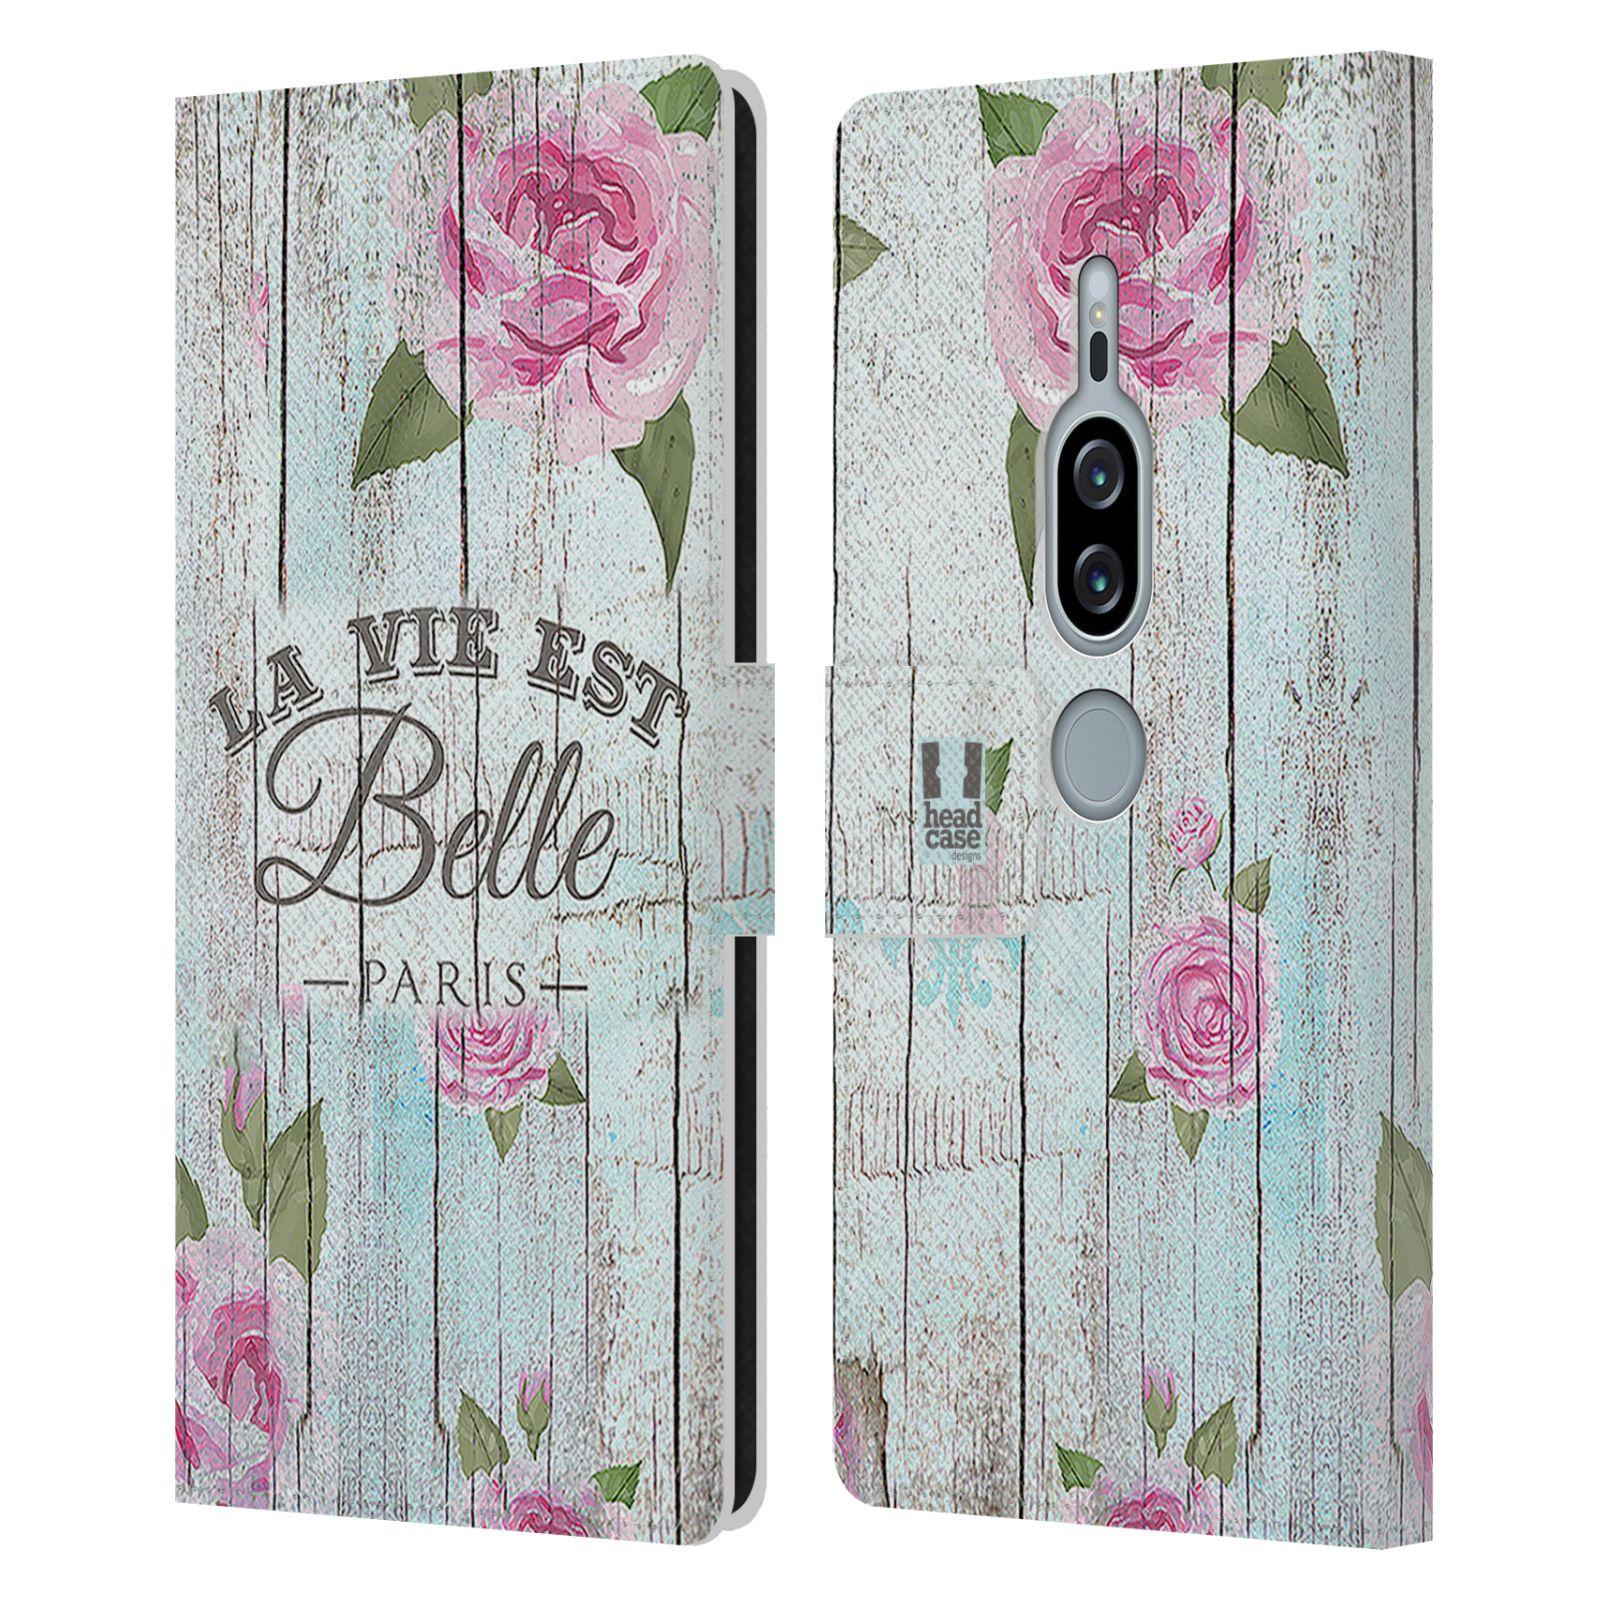 Pouzdro na mobil Sony Xperia XZ2 Premium - Head Case - květinový motiv růže na plotě